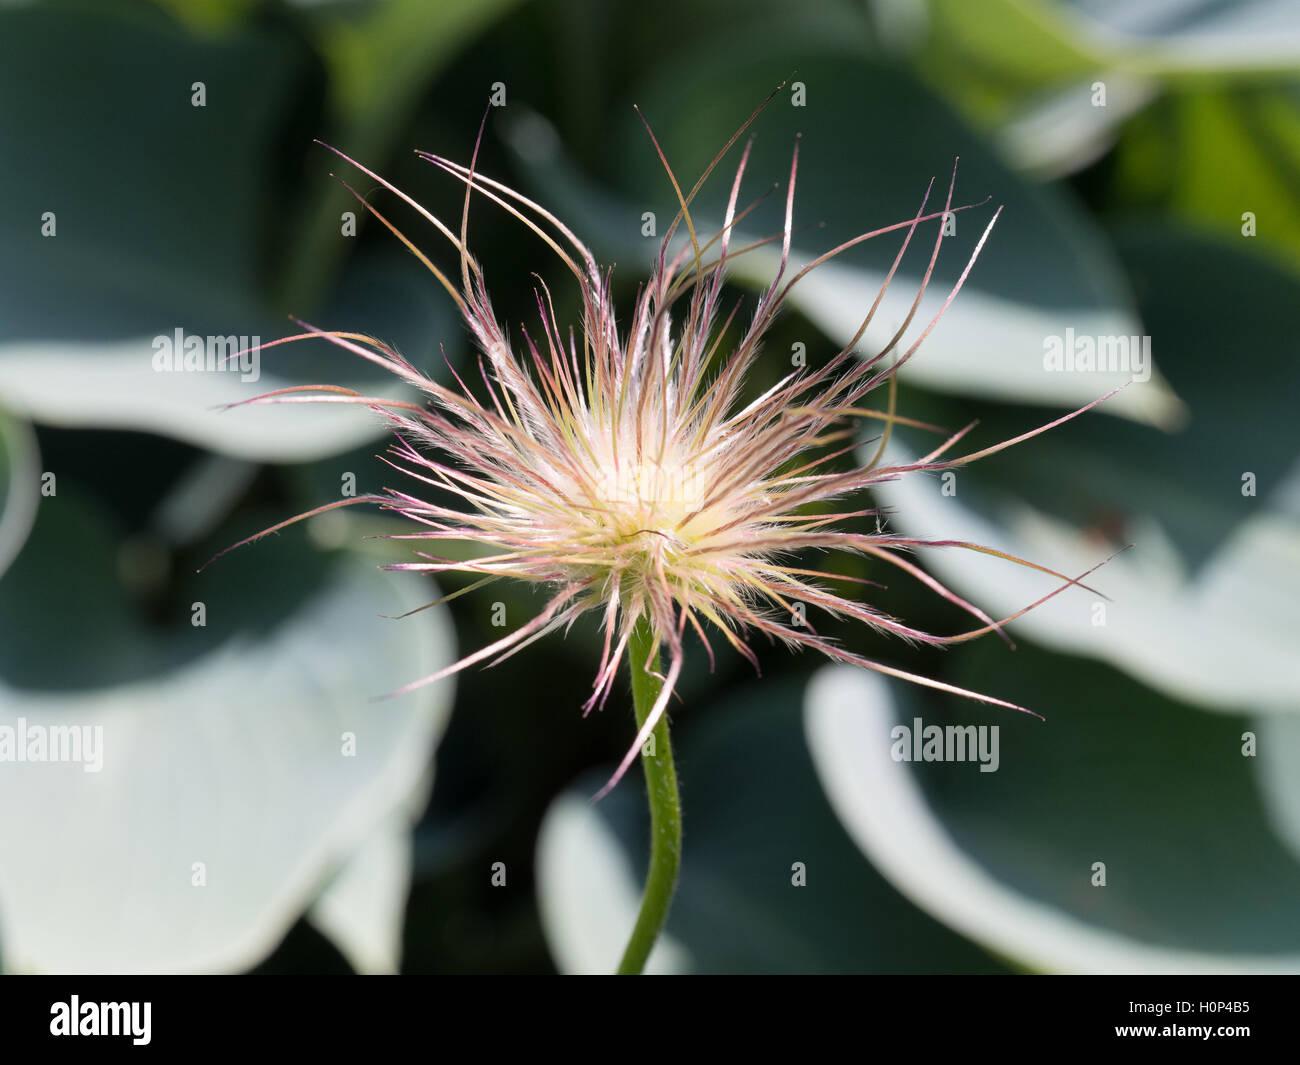 Pasque flower seedhead - Stock Image